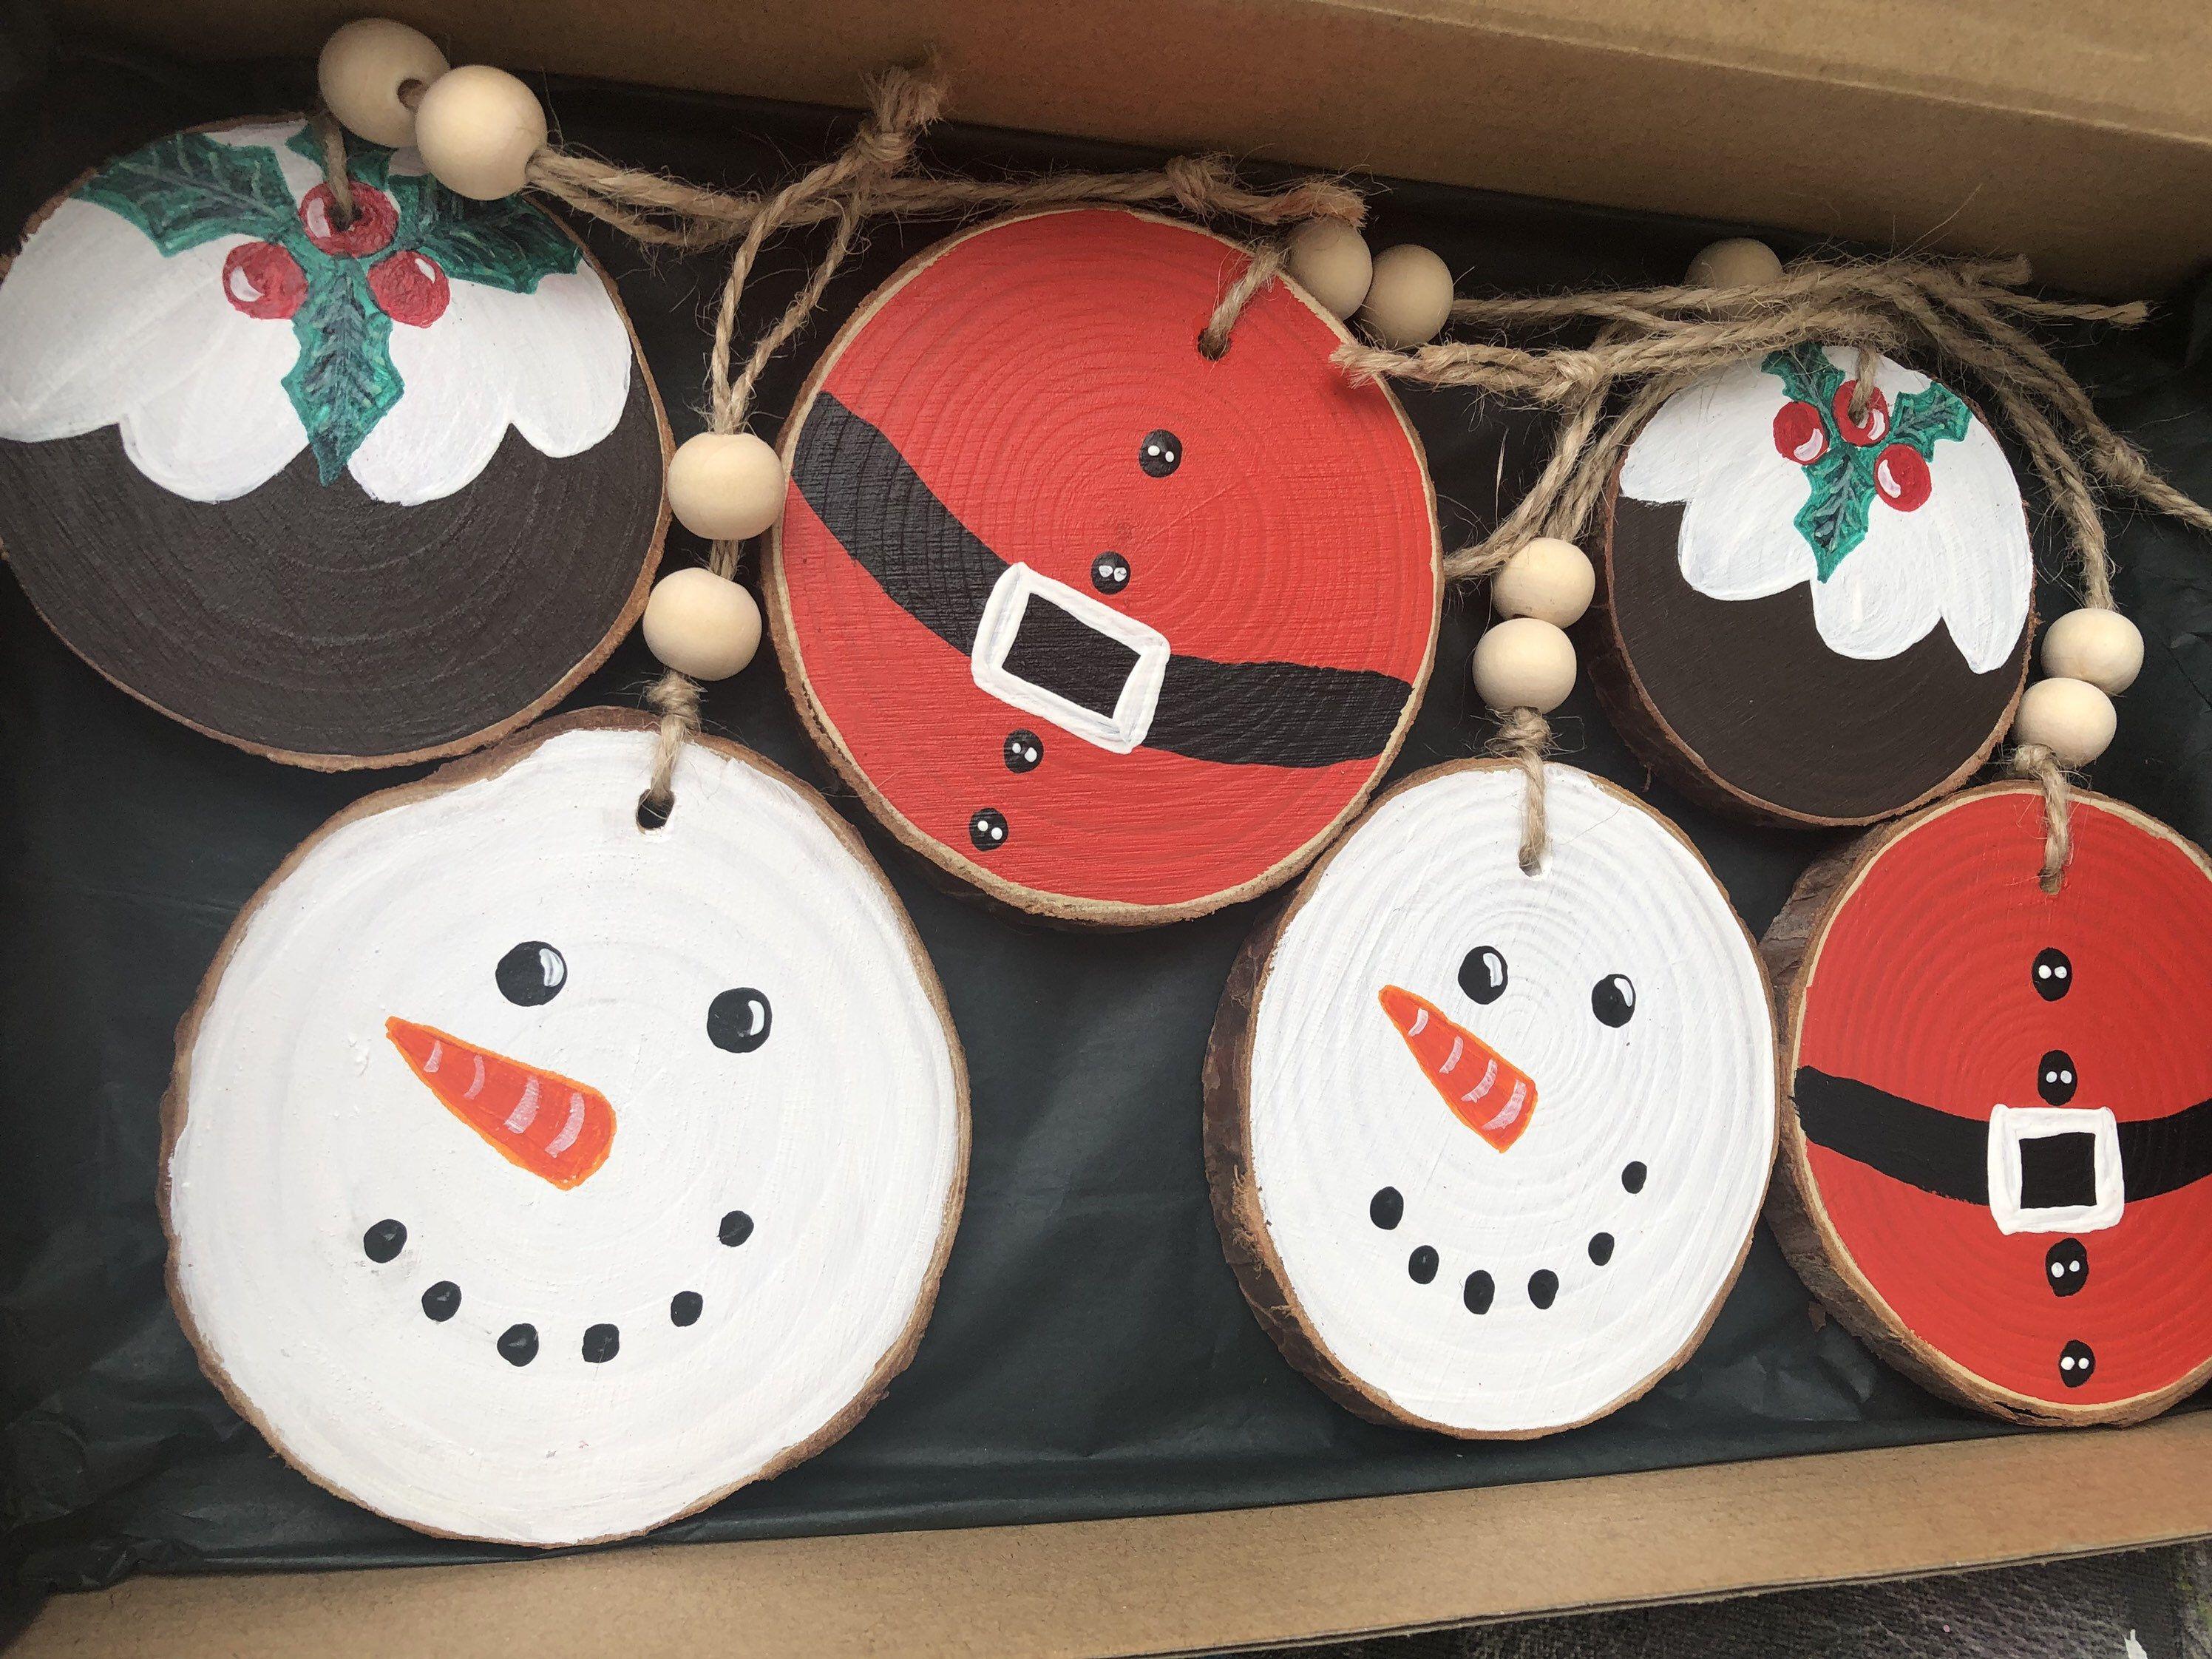 Set Of 5 Christmas Wood Slice Coasters Tree Decoration Etsy In 2020 Christmas Wood Wood Slices Snowman Christmas Ornaments